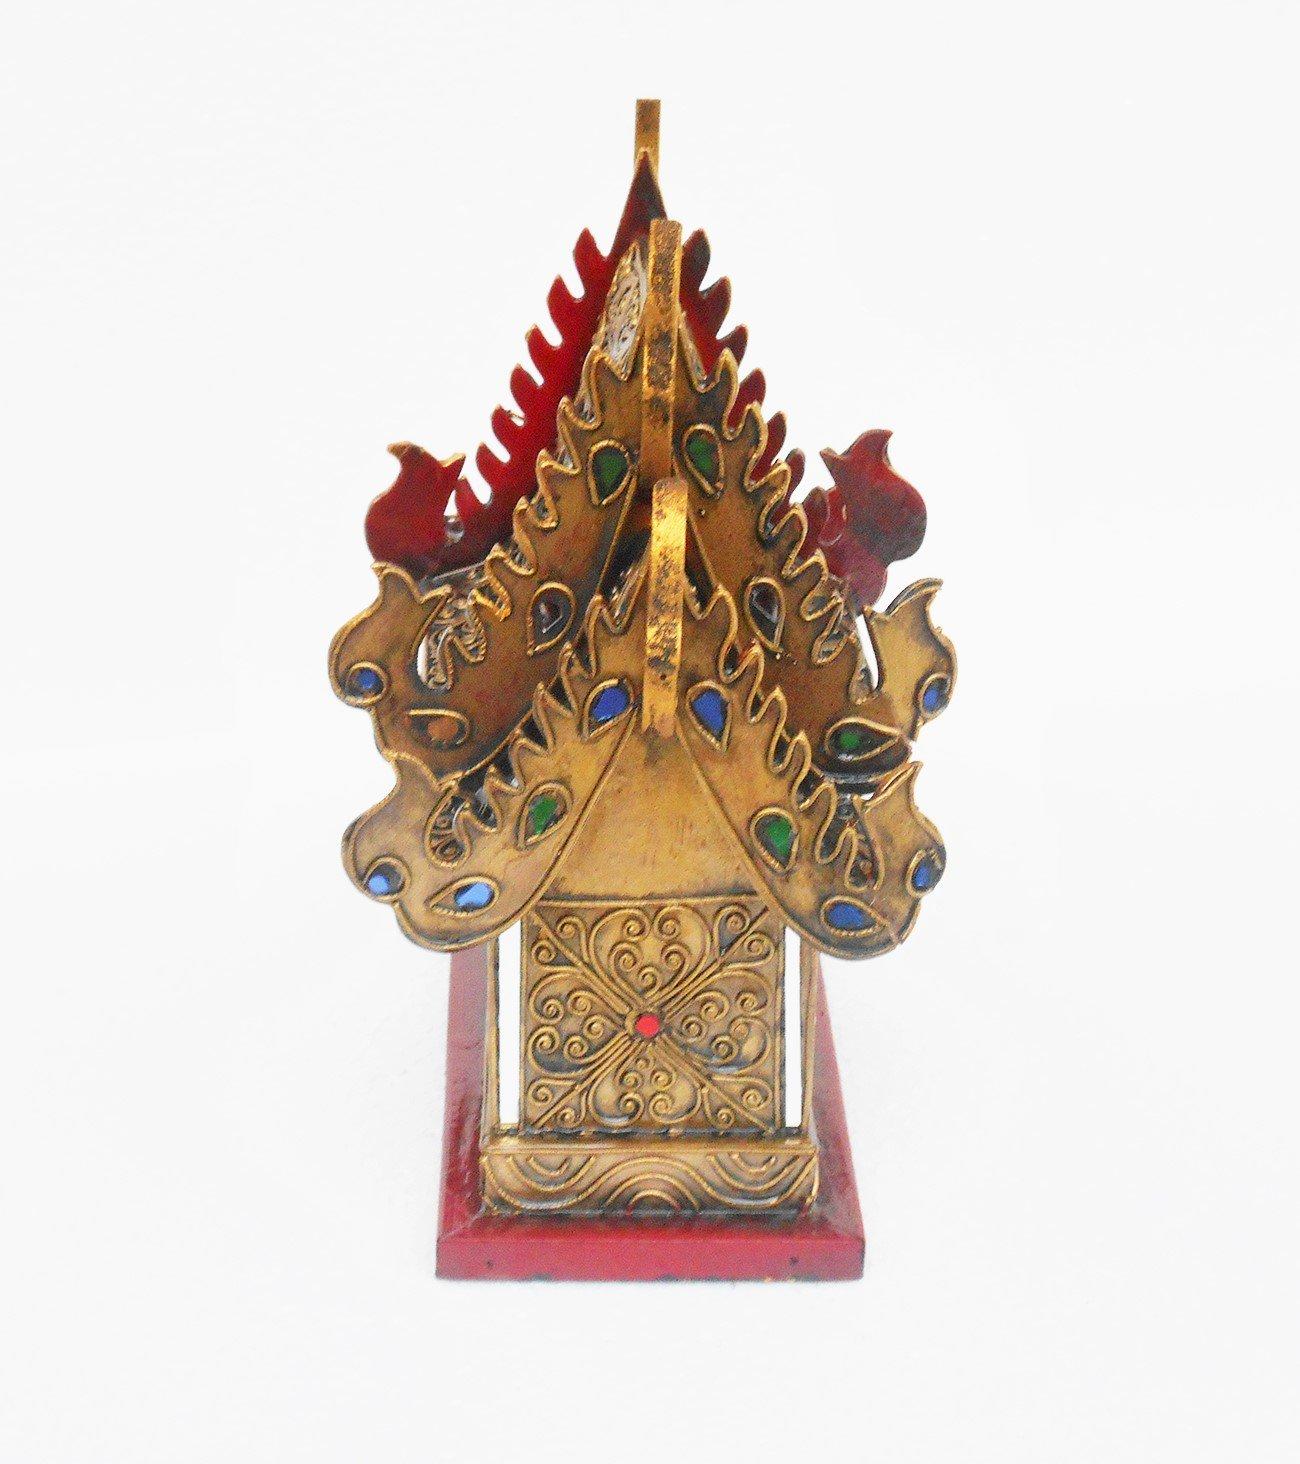 Thai Spirit House Large107 Sanpraphum10 Thai Handmade Spirit House Wood Gold Glass Color,